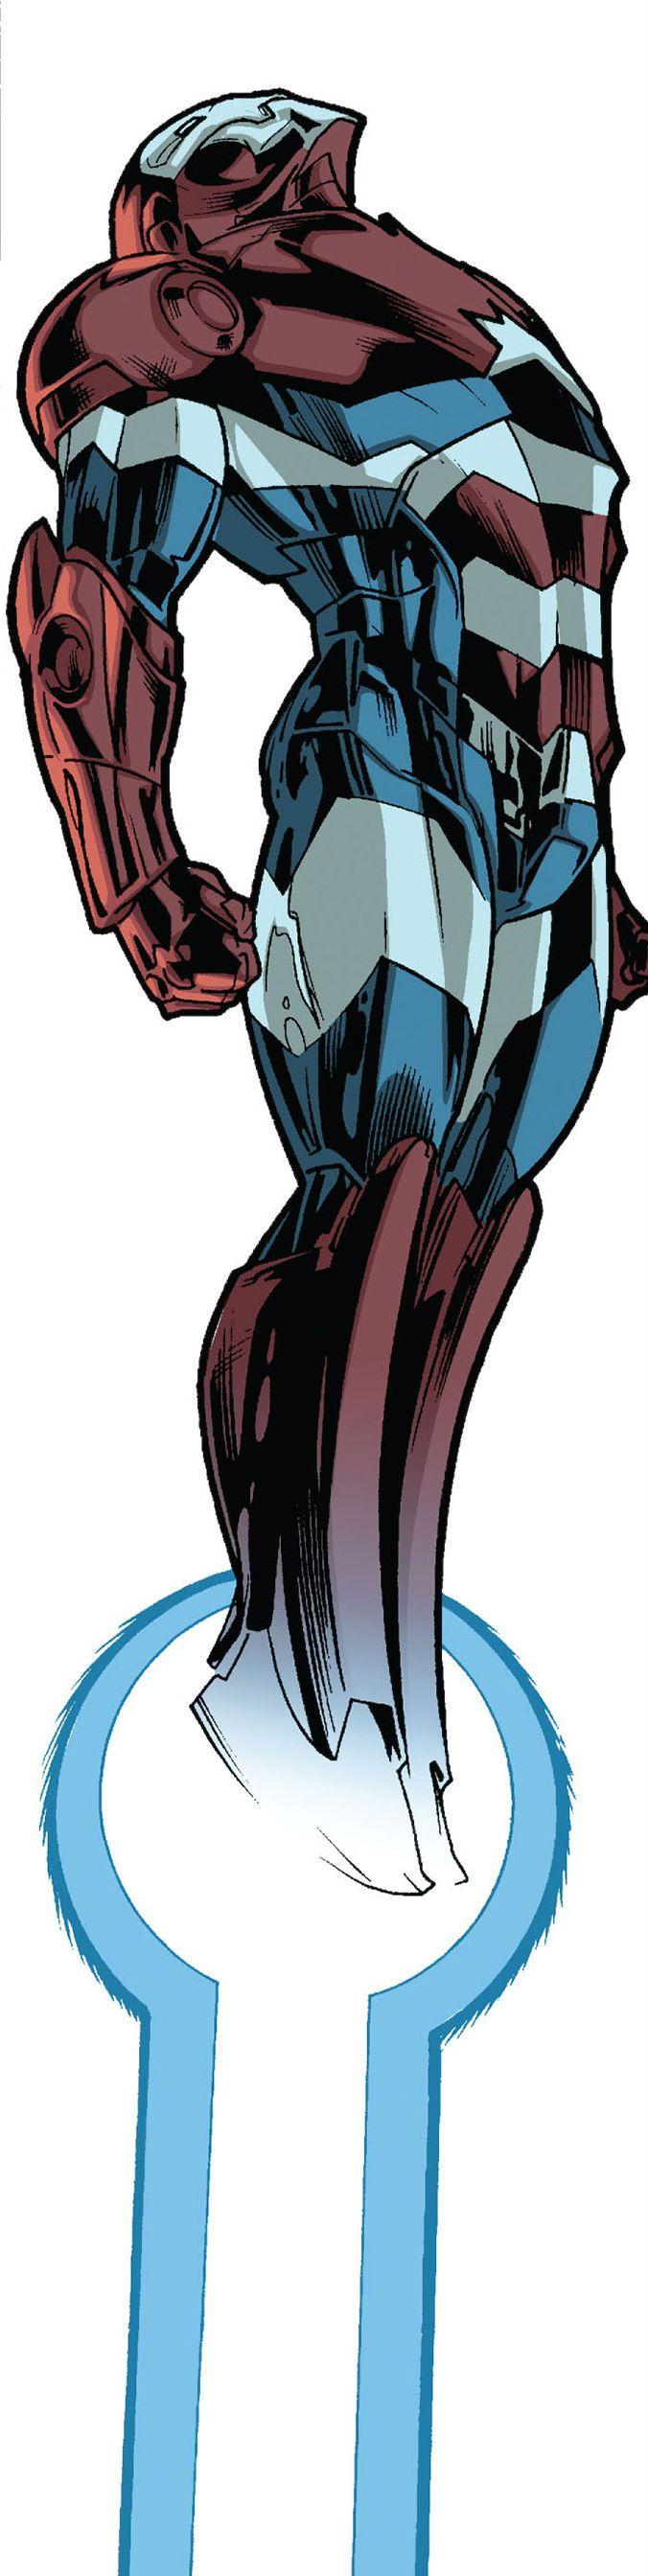 Pin by El Paisa Ruiz on Fordsbuilt for girls Iron man